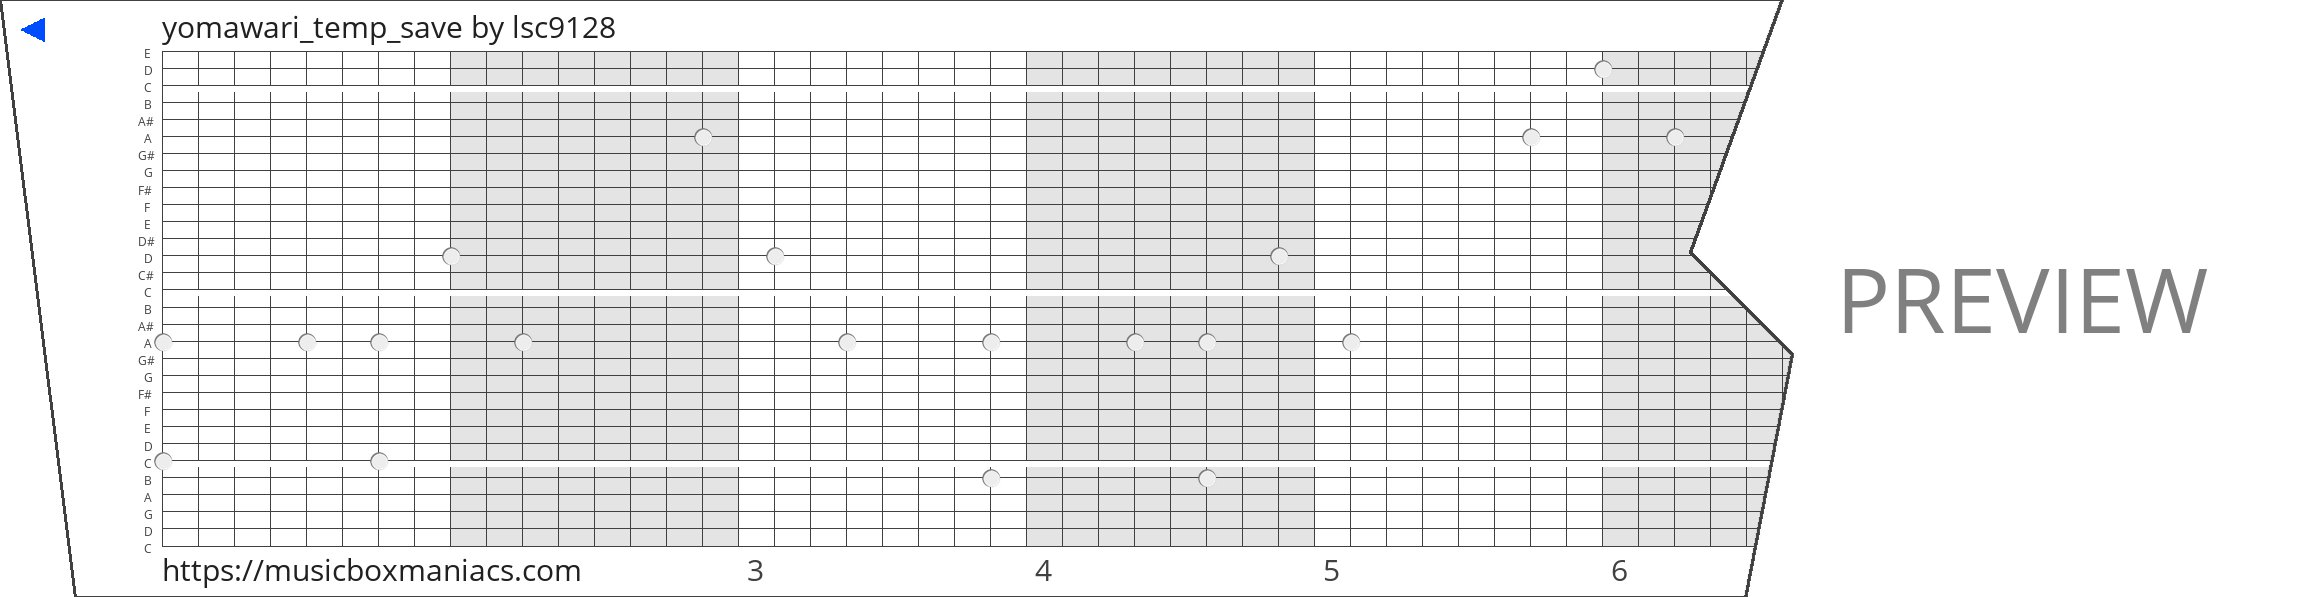 yomawari_temp_save 30 note music box paper strip